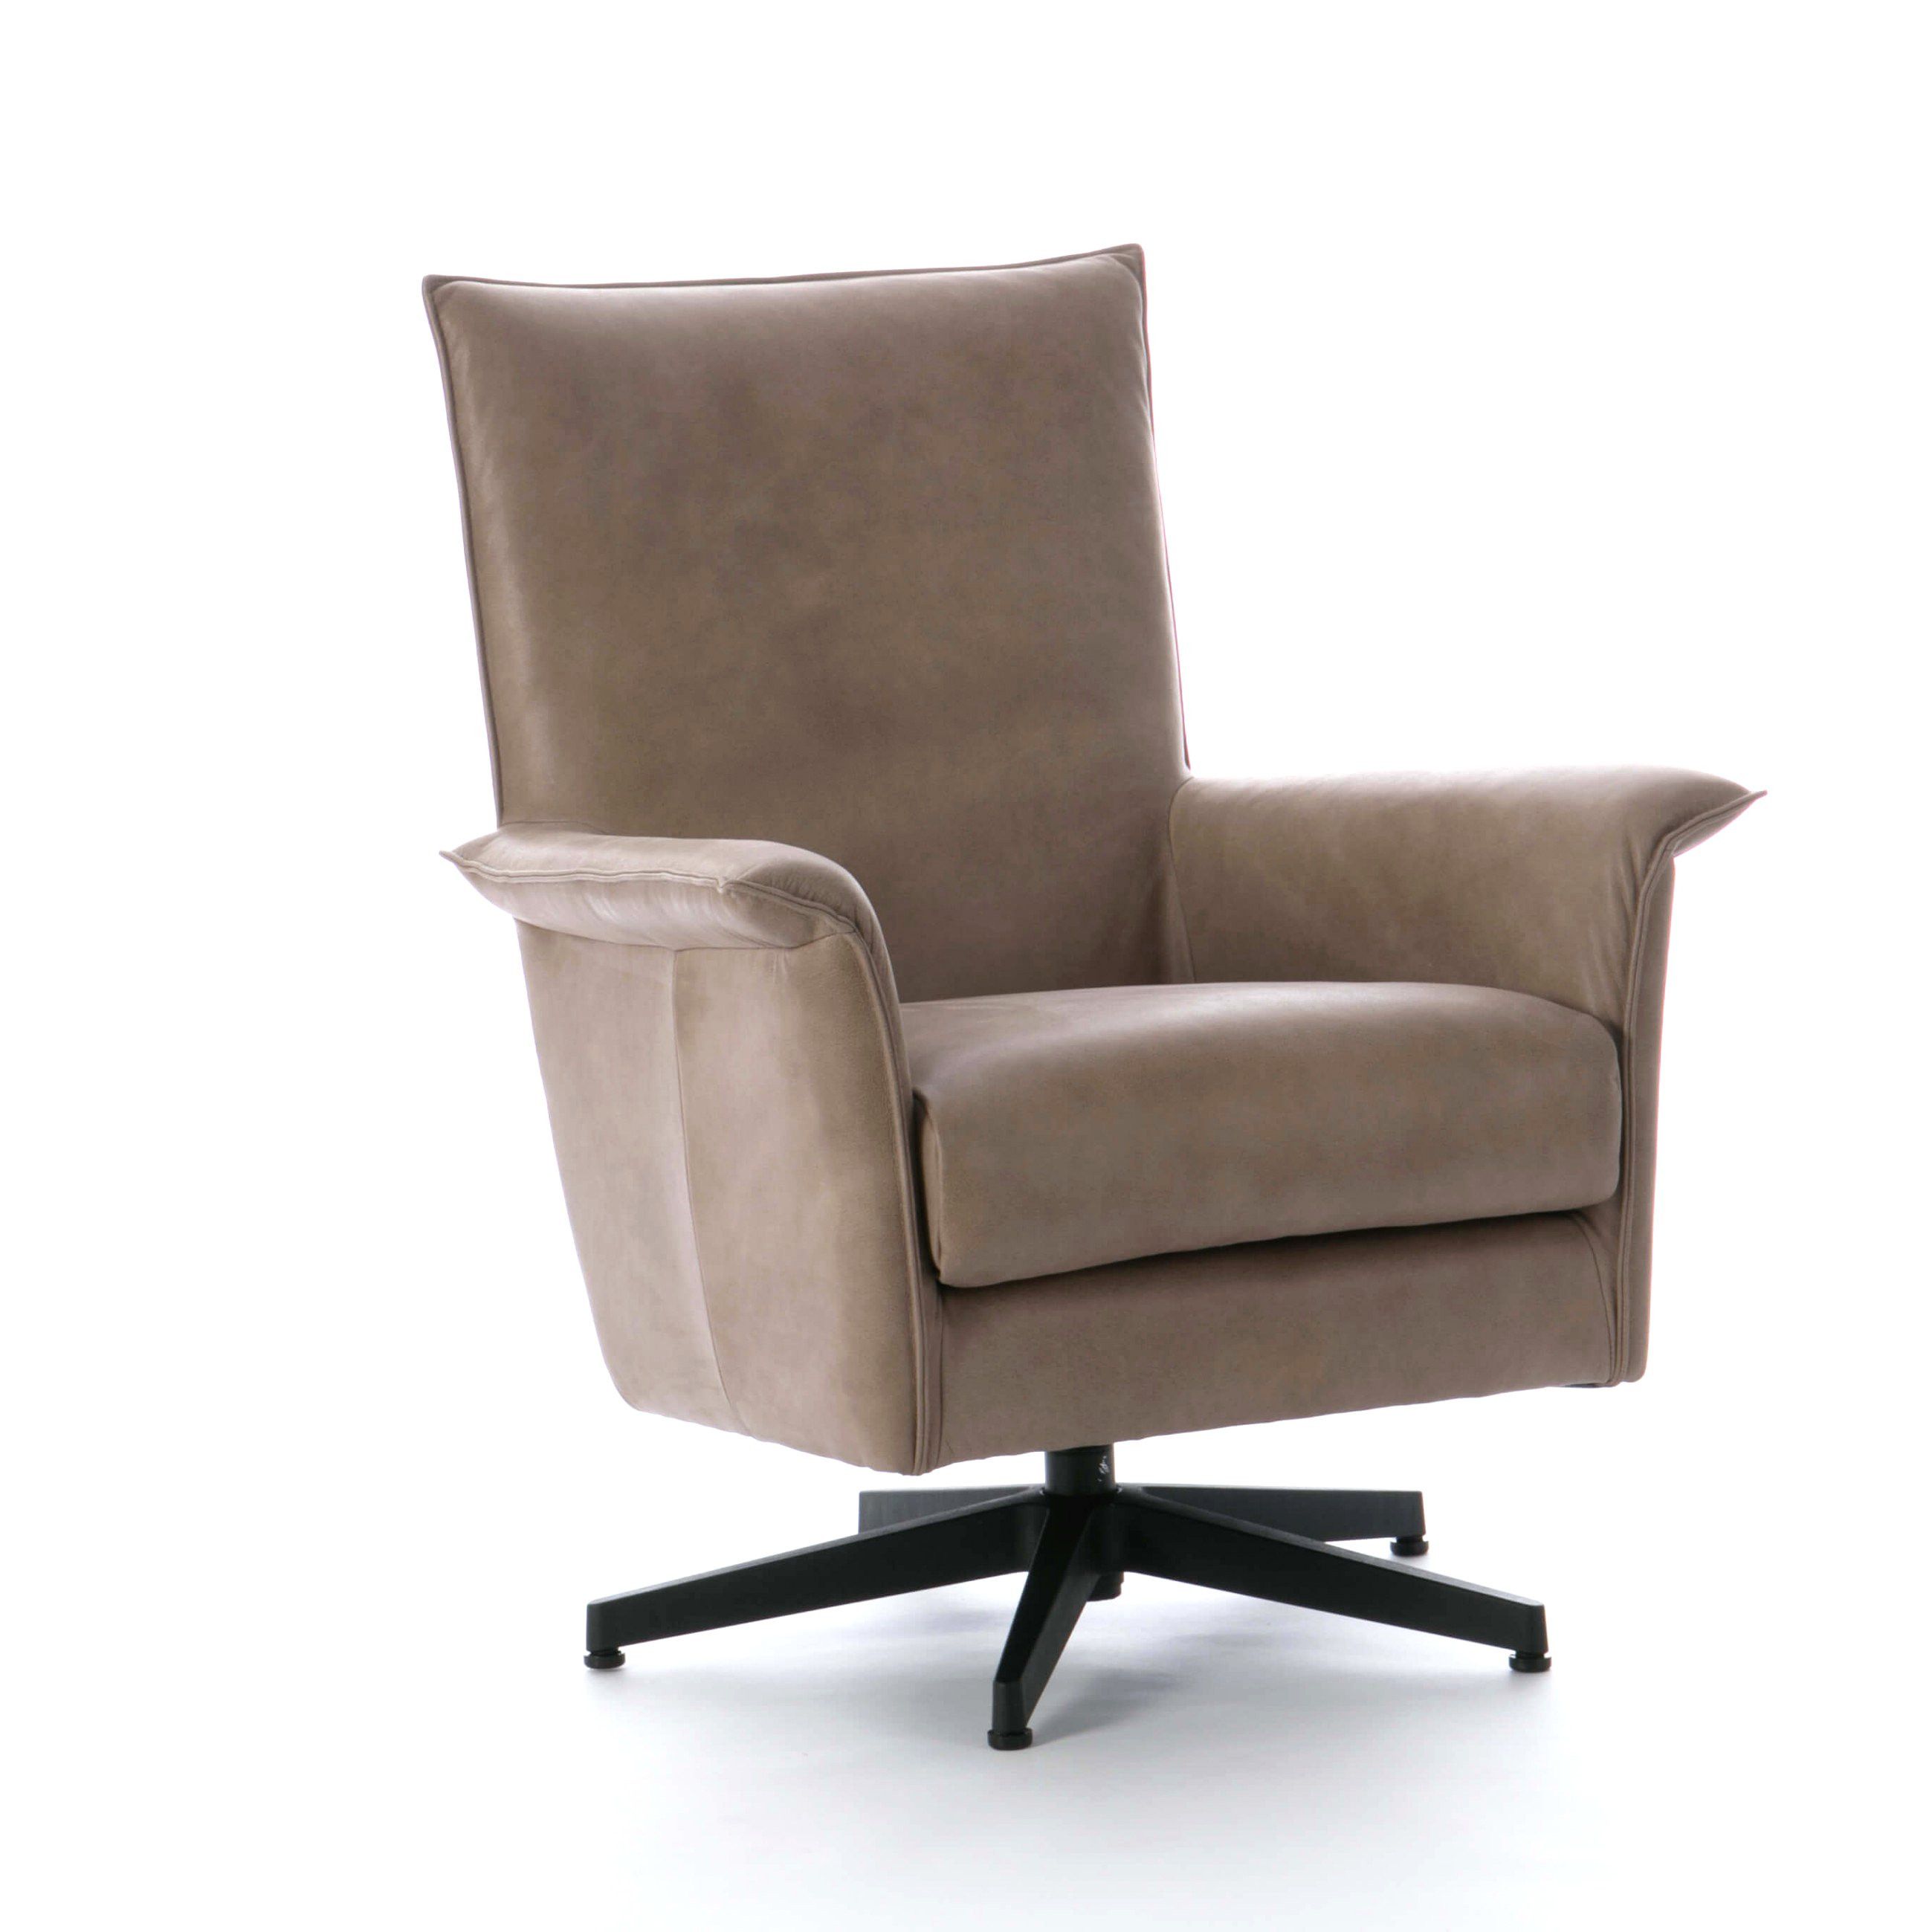 Die Besten Ikea Sessel Gelb Beste Wohnkultur Bastelideen Coloring und Frisur Inspiration